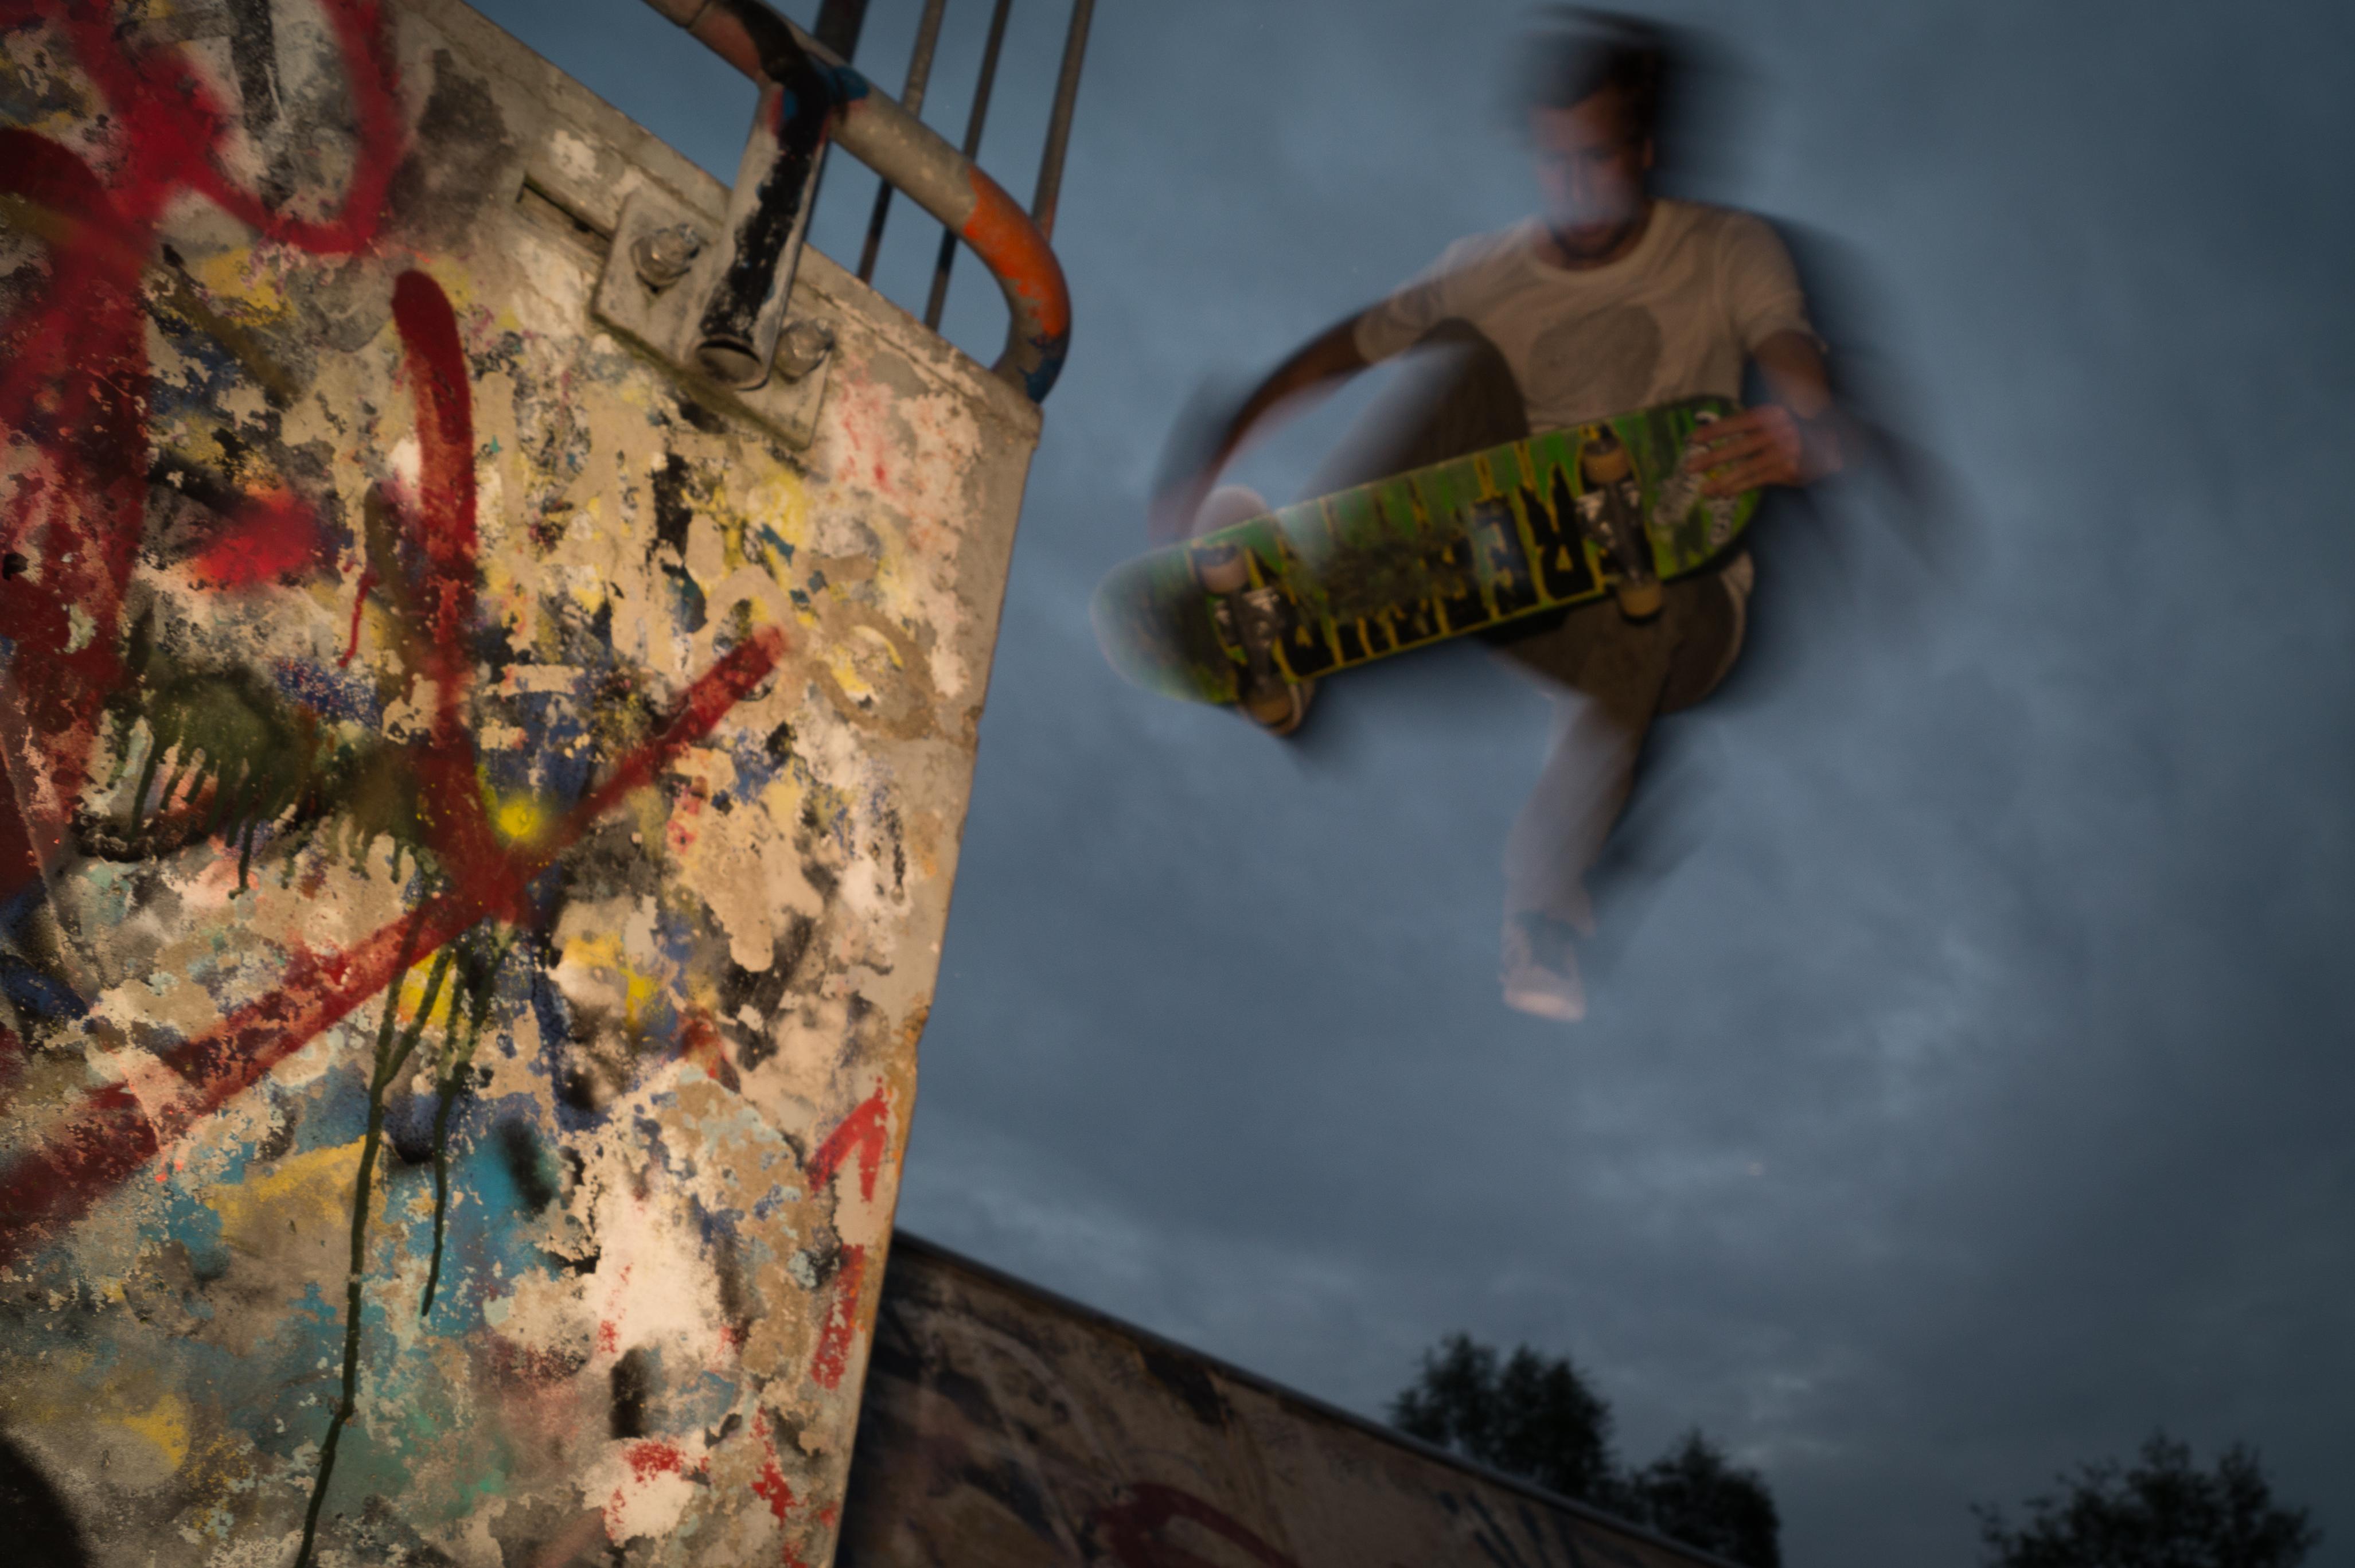 Skateboard-jump-free-license-CCo